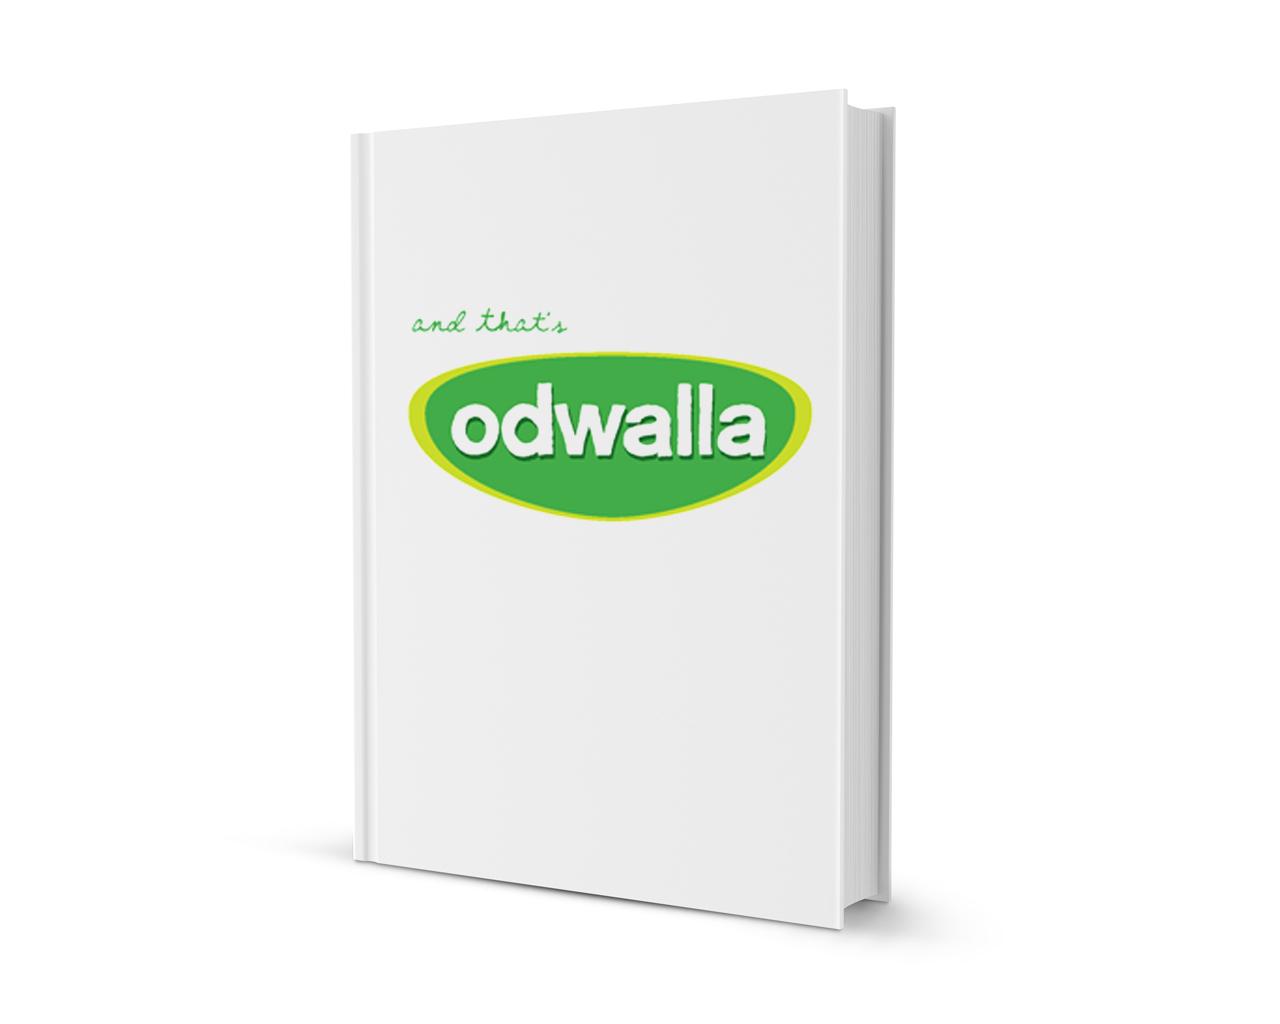 odwalla.cover.jpg